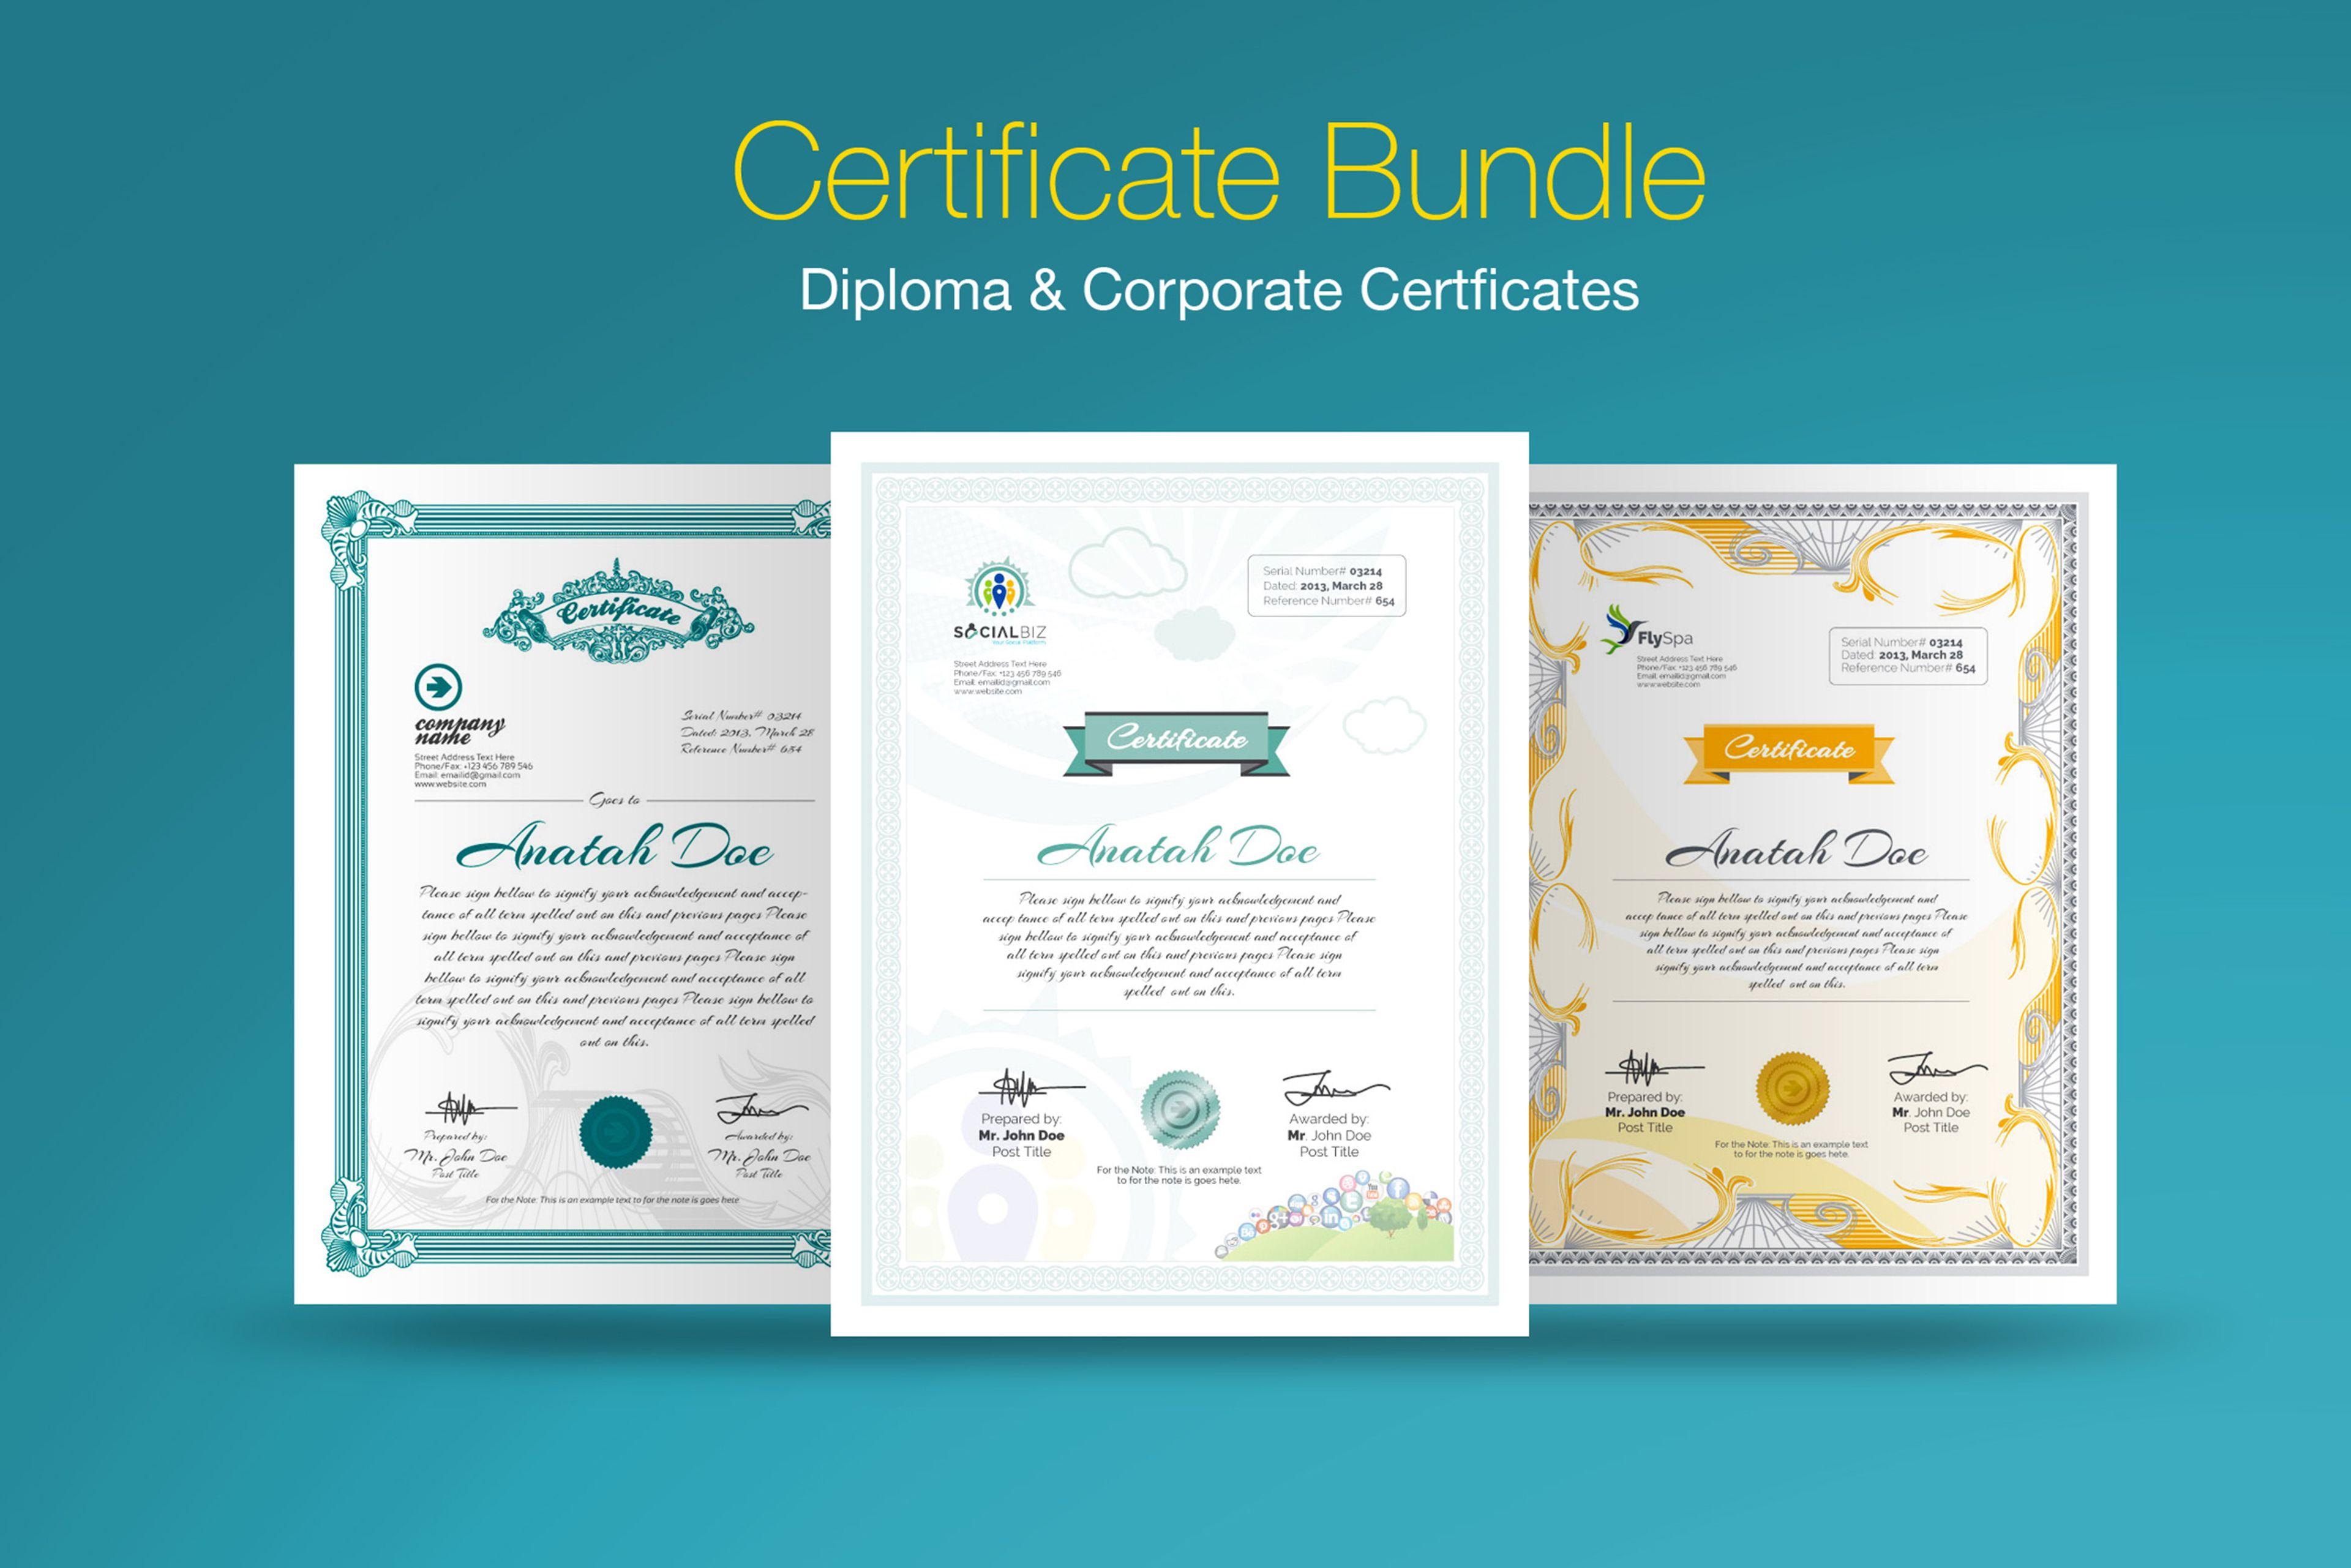 Diploma Certificate Bundle Certificate Template 66892